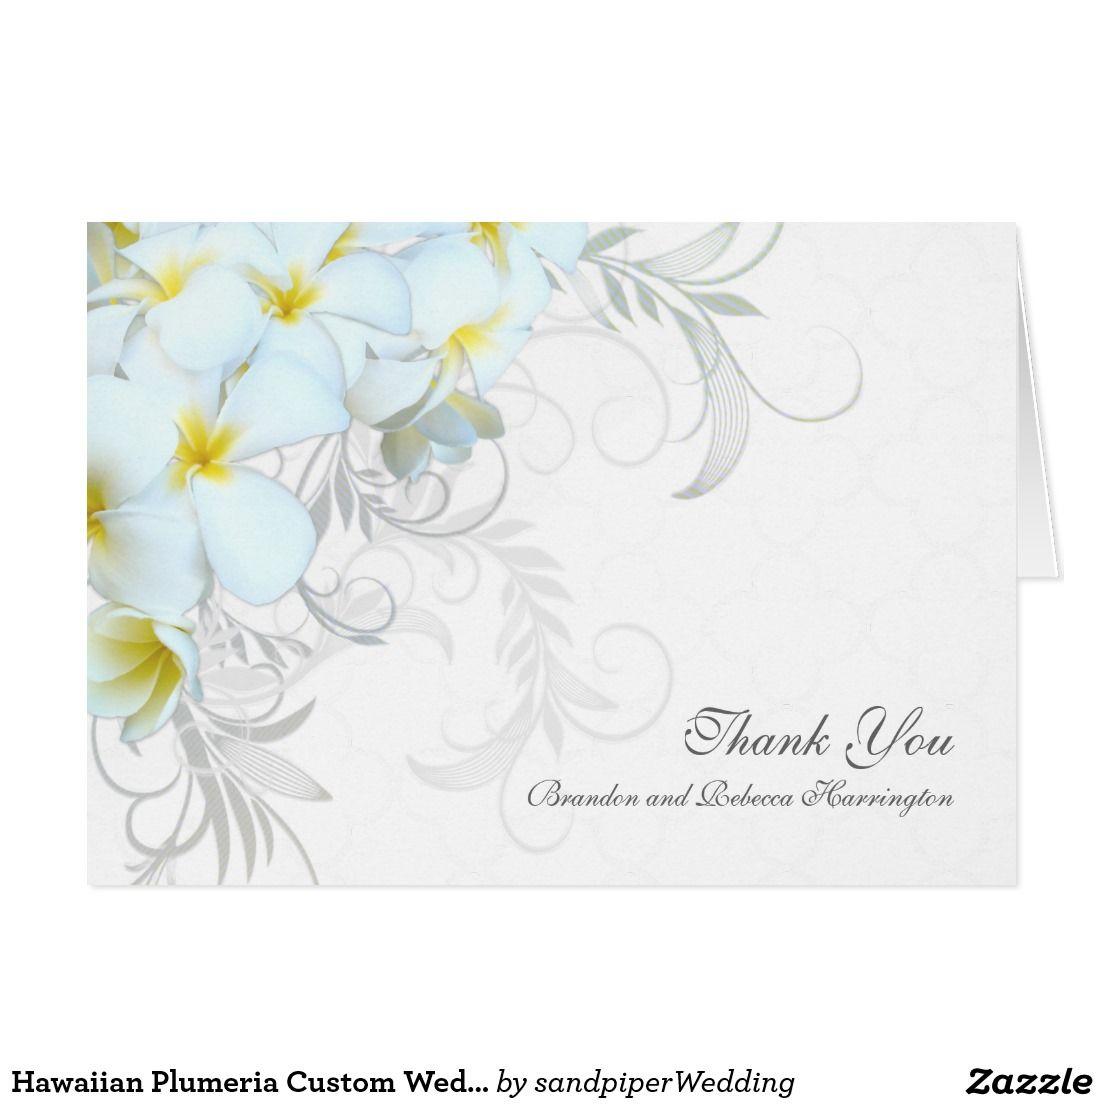 Hawaiian Plumeria Custom Wedding Thank You Cards | Wedding Thank You ...